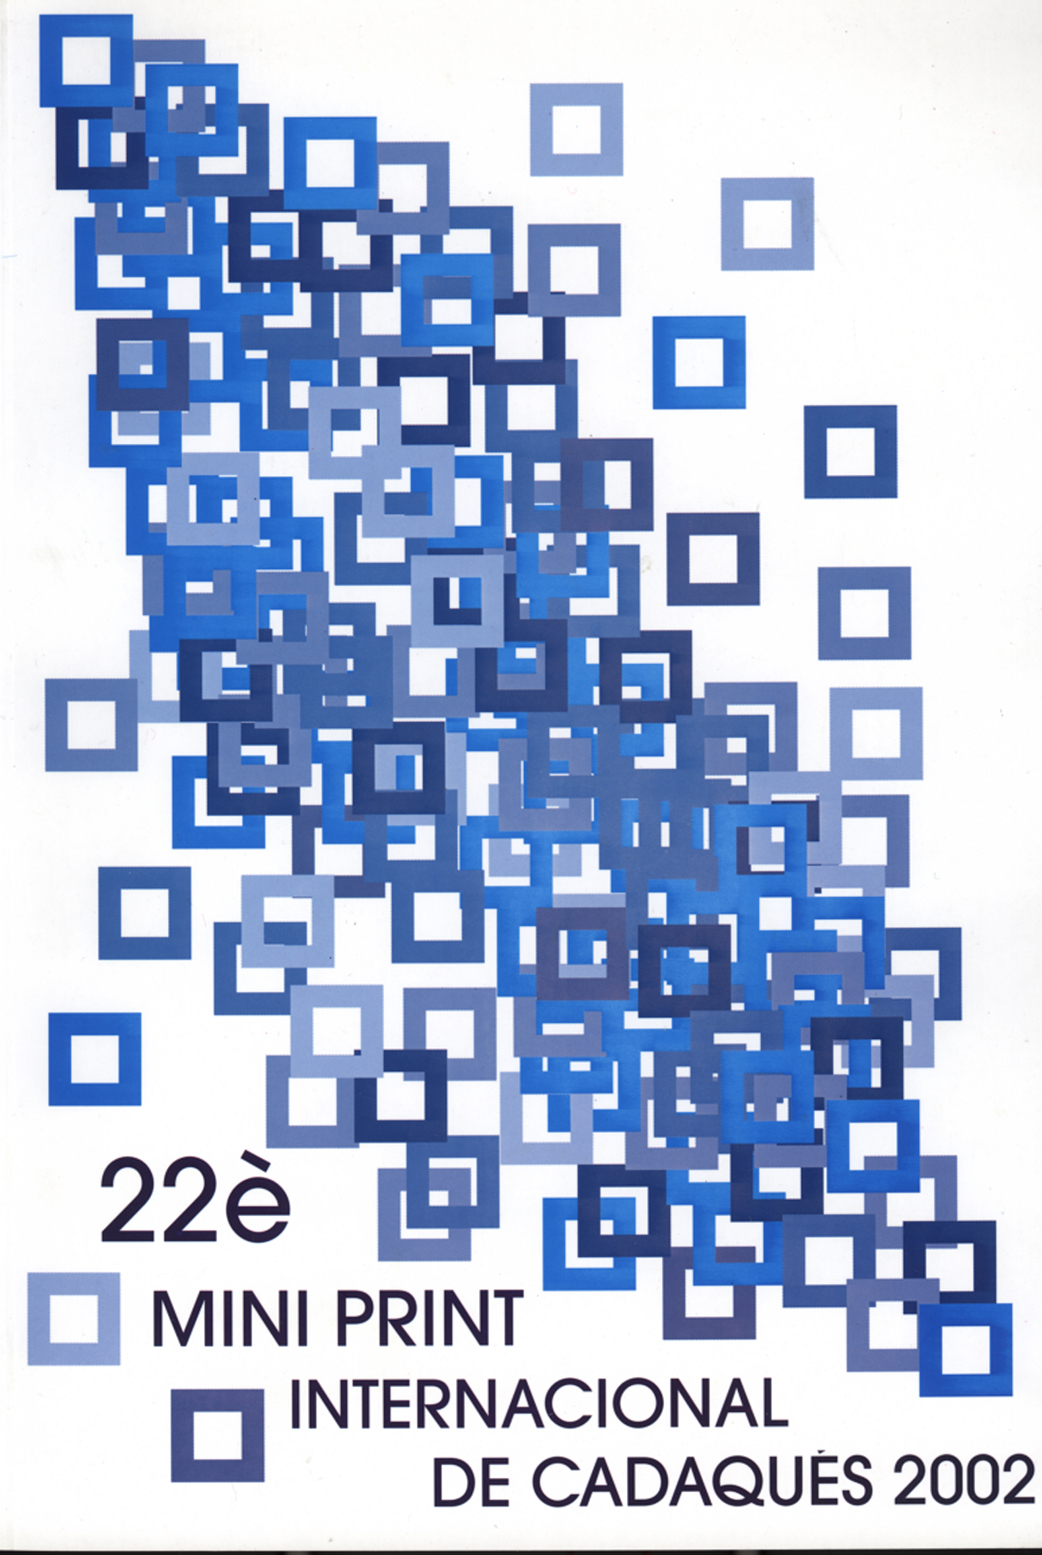 Cadaque02.jpg